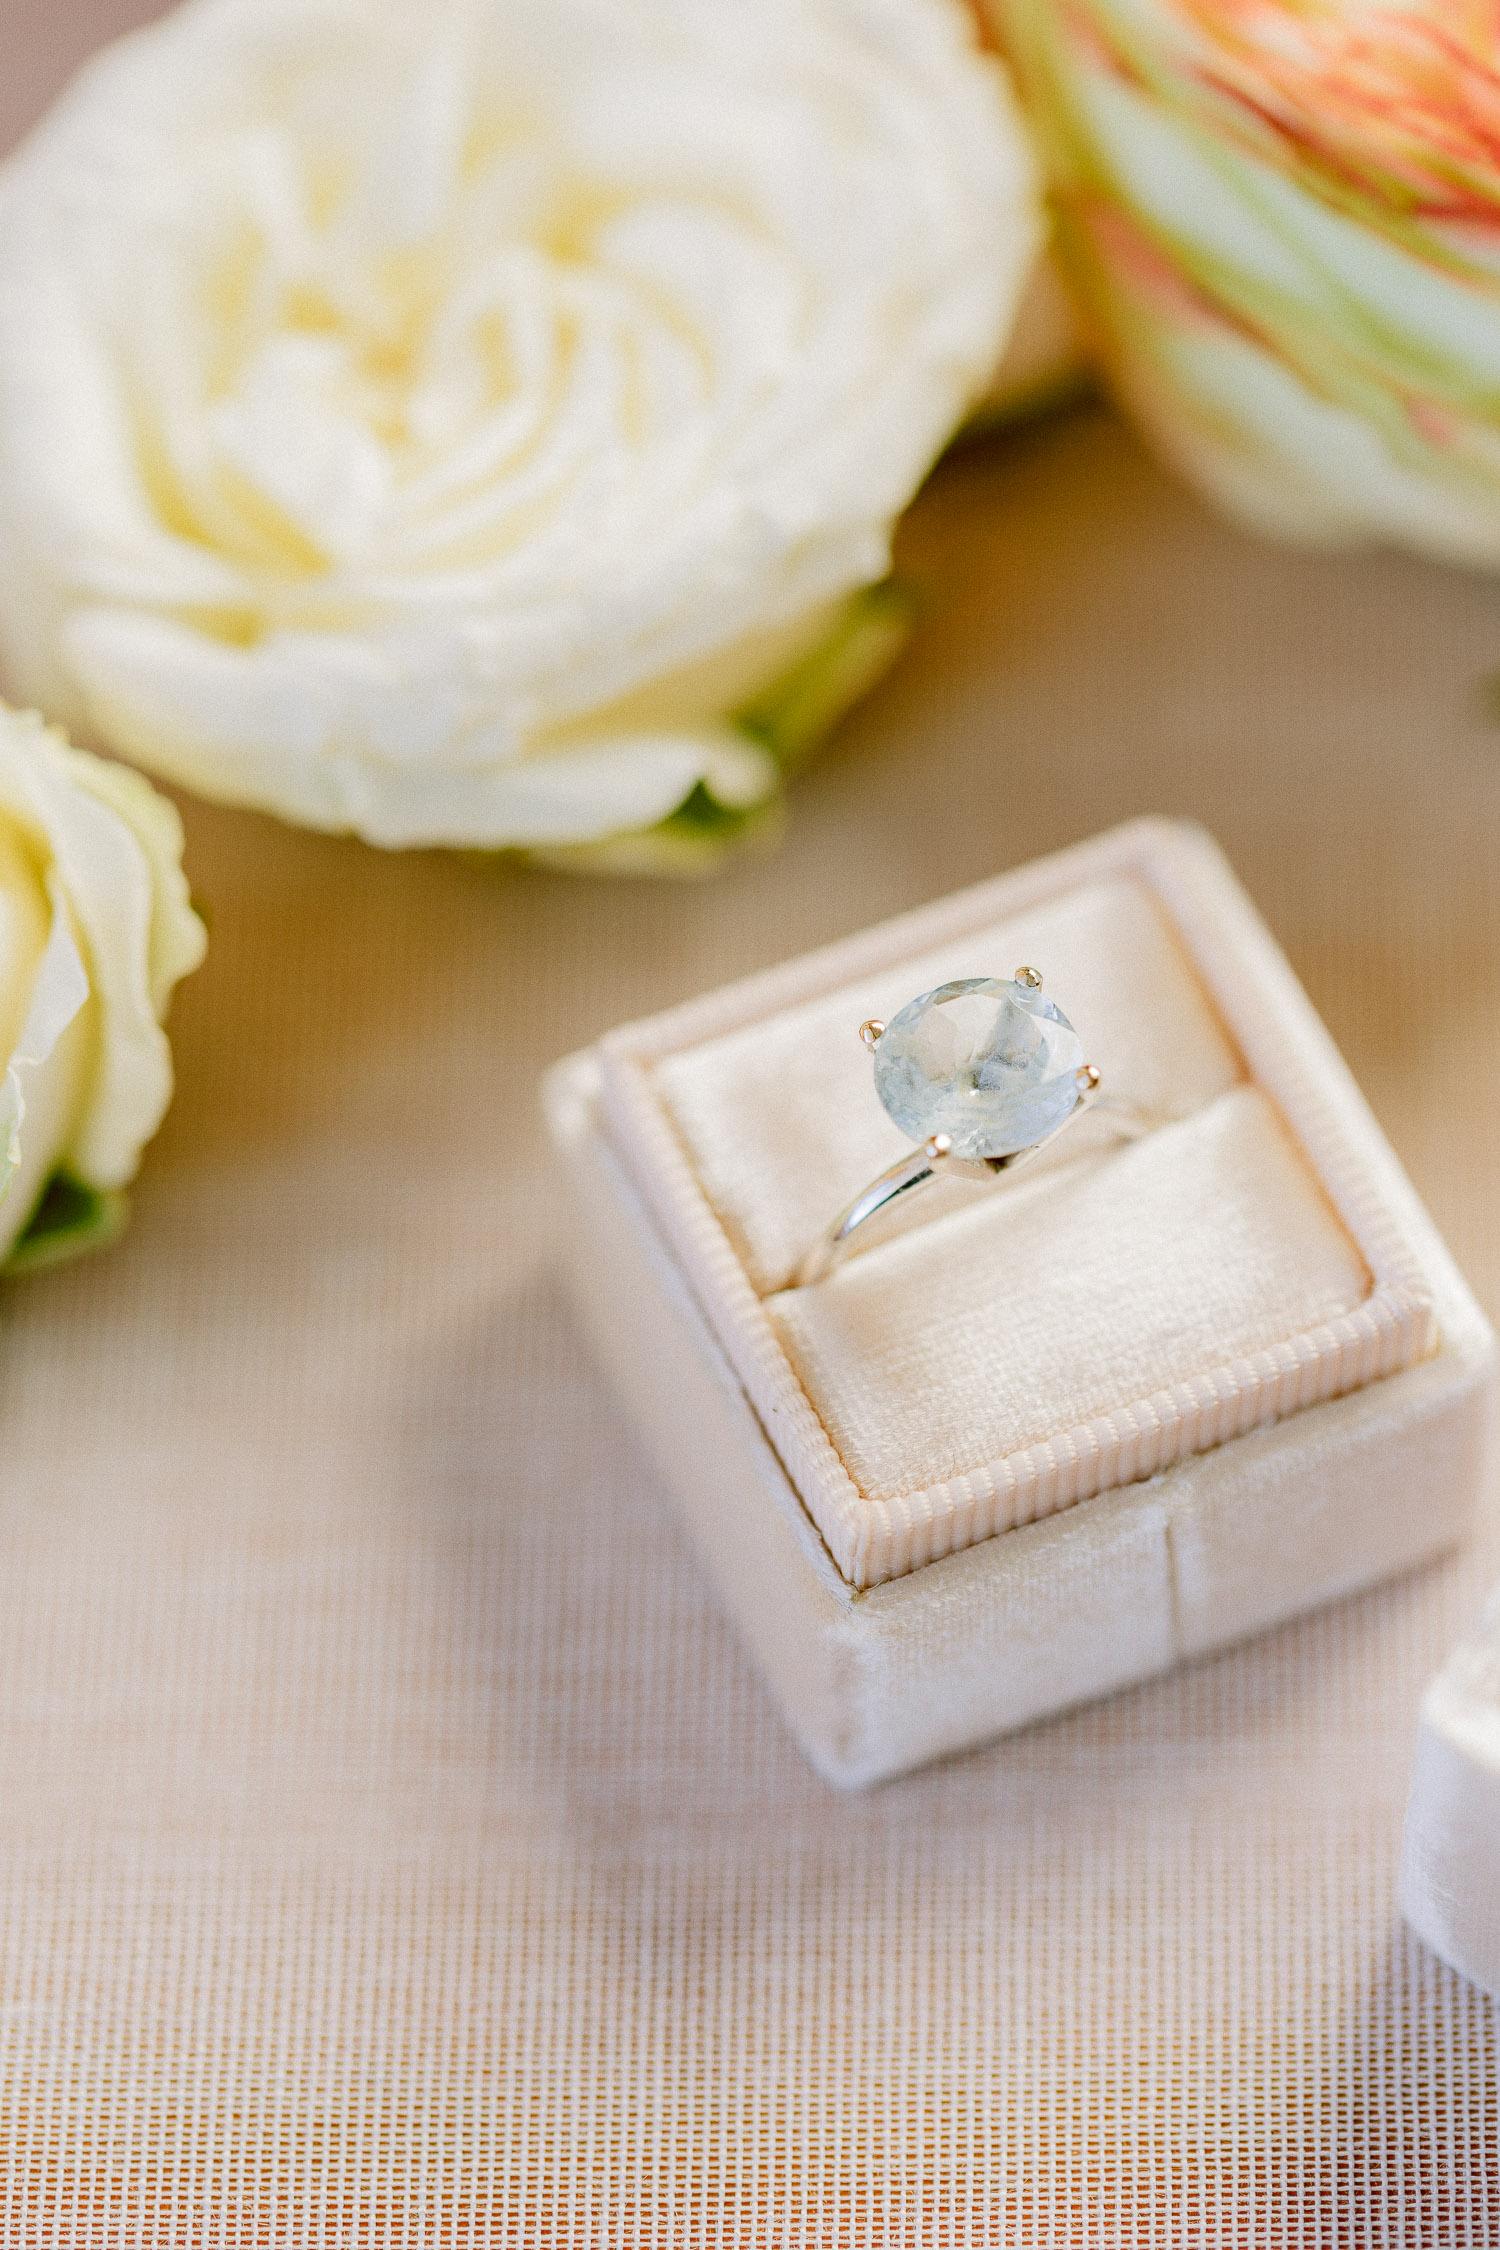 Round cut engagement ring detail in pink velvet ring box